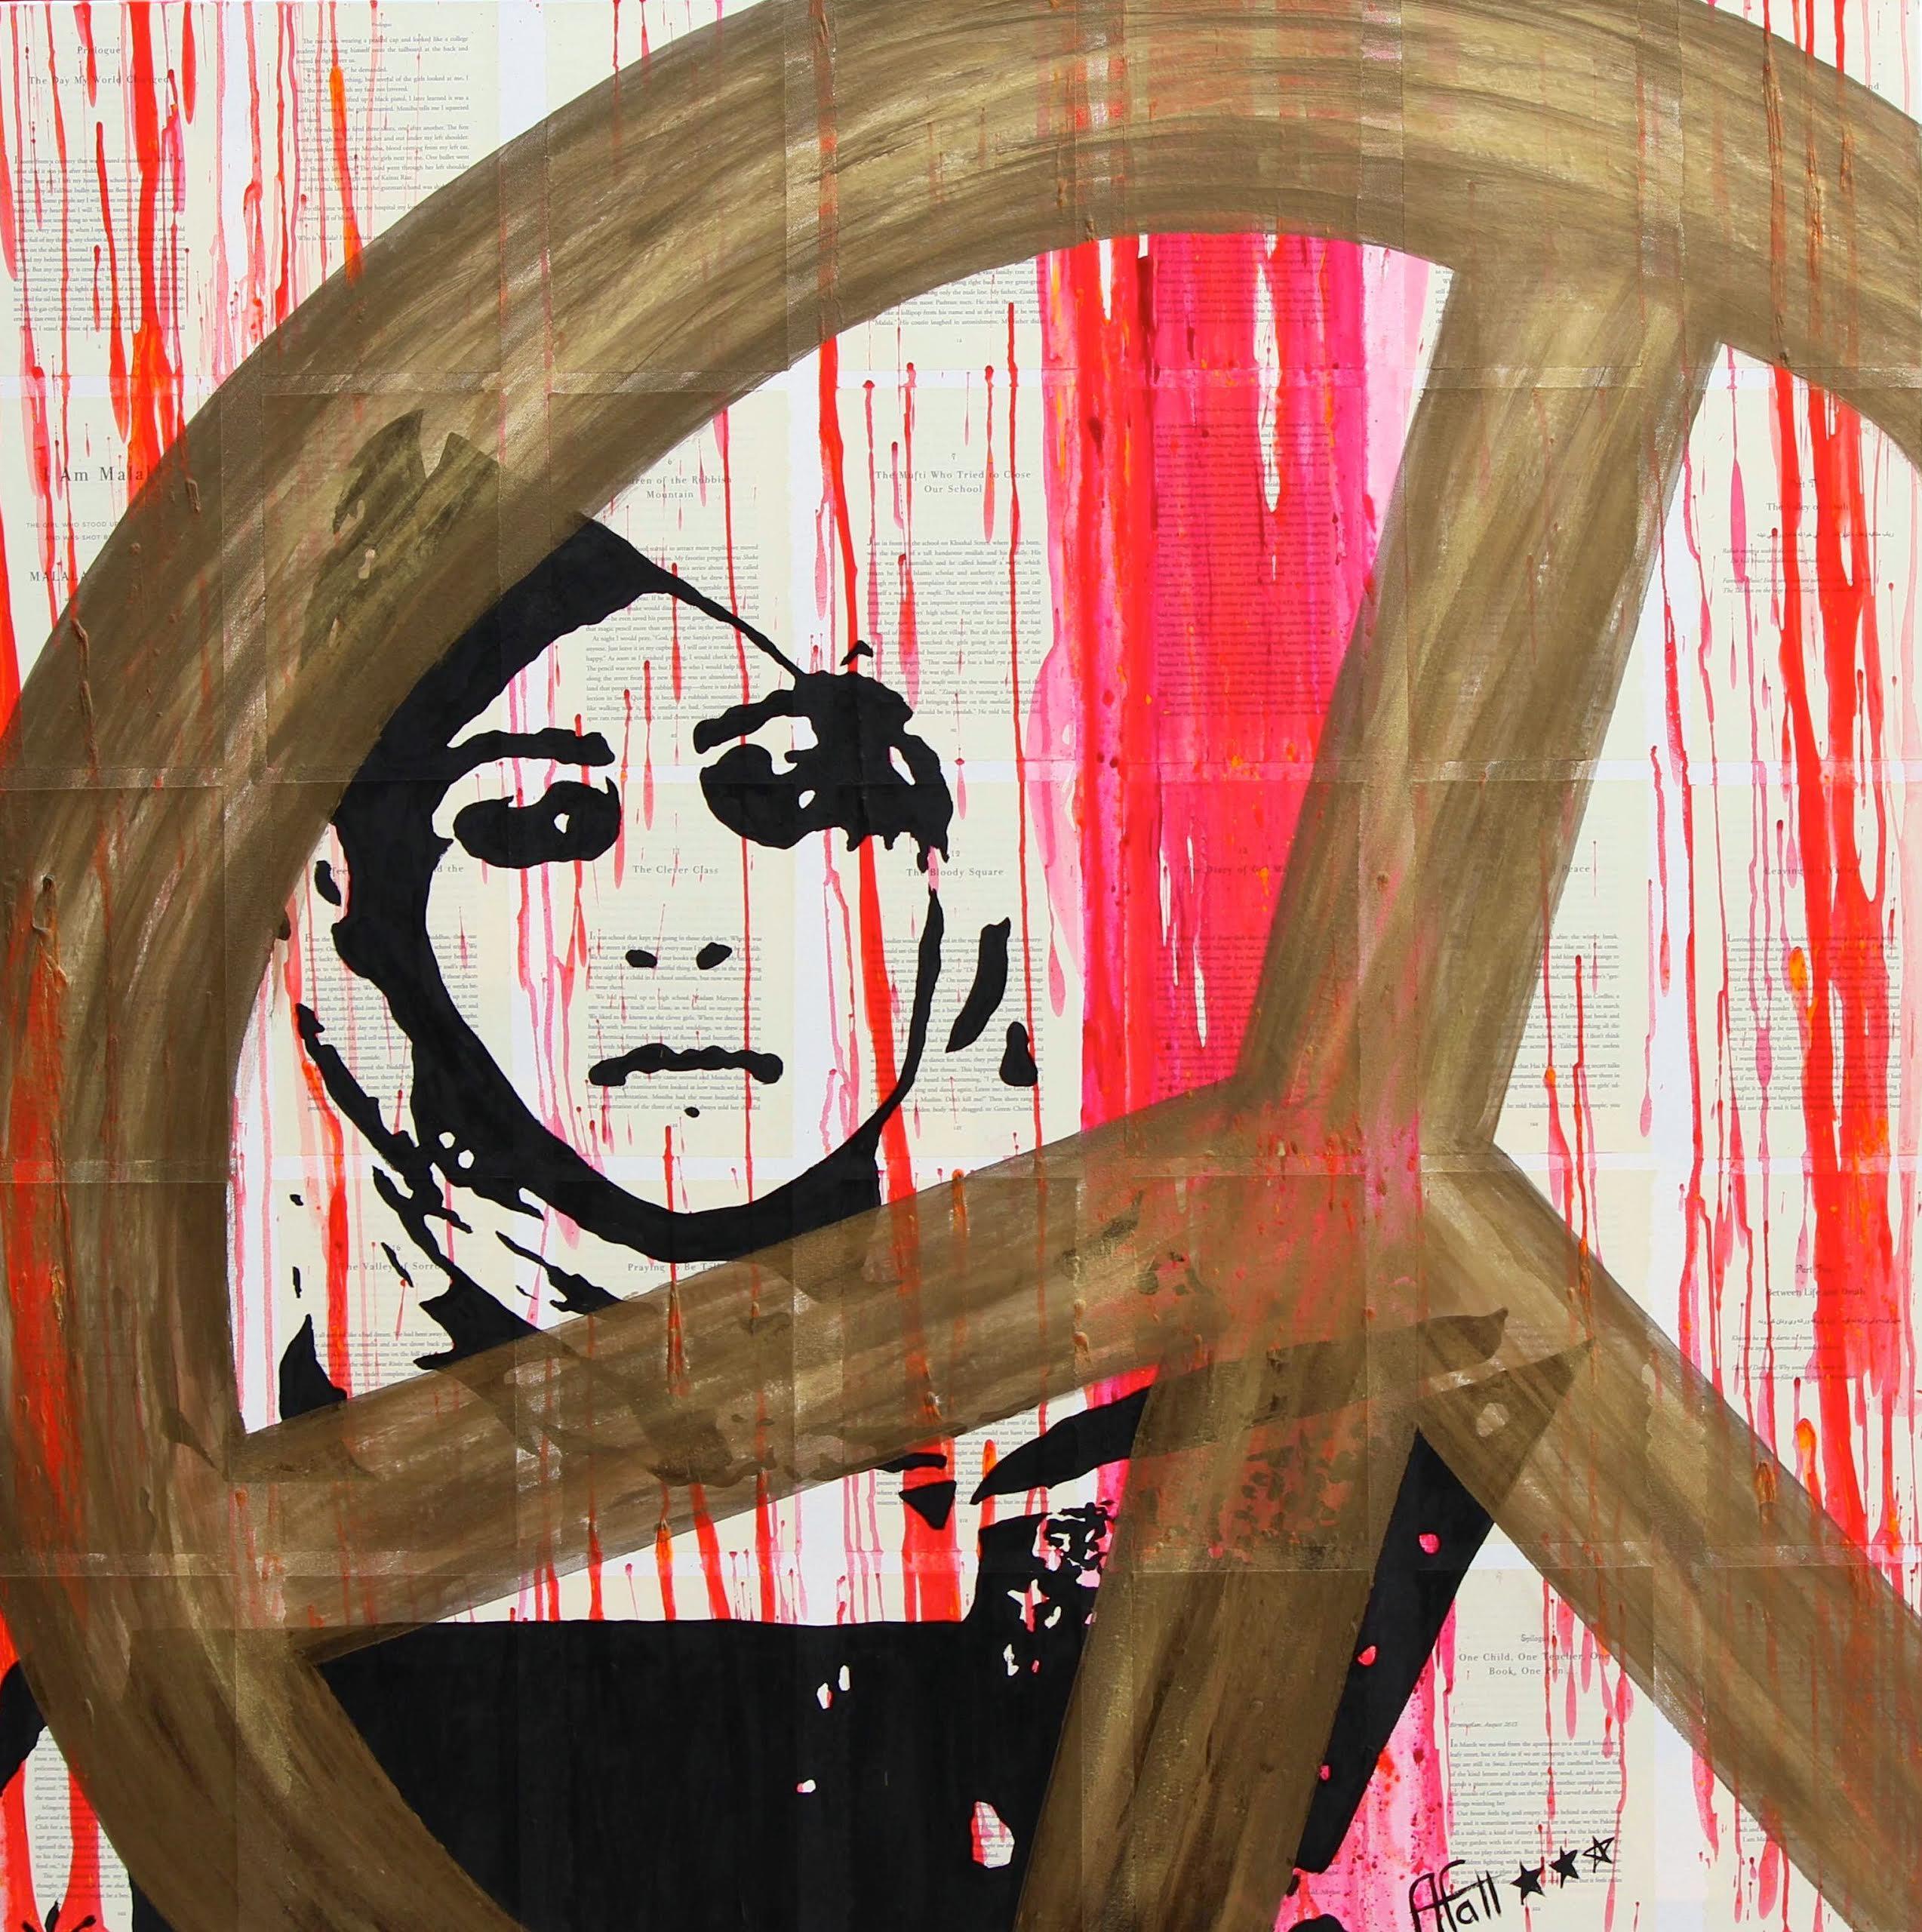 Malala Yousafzai by Armelle Falliex